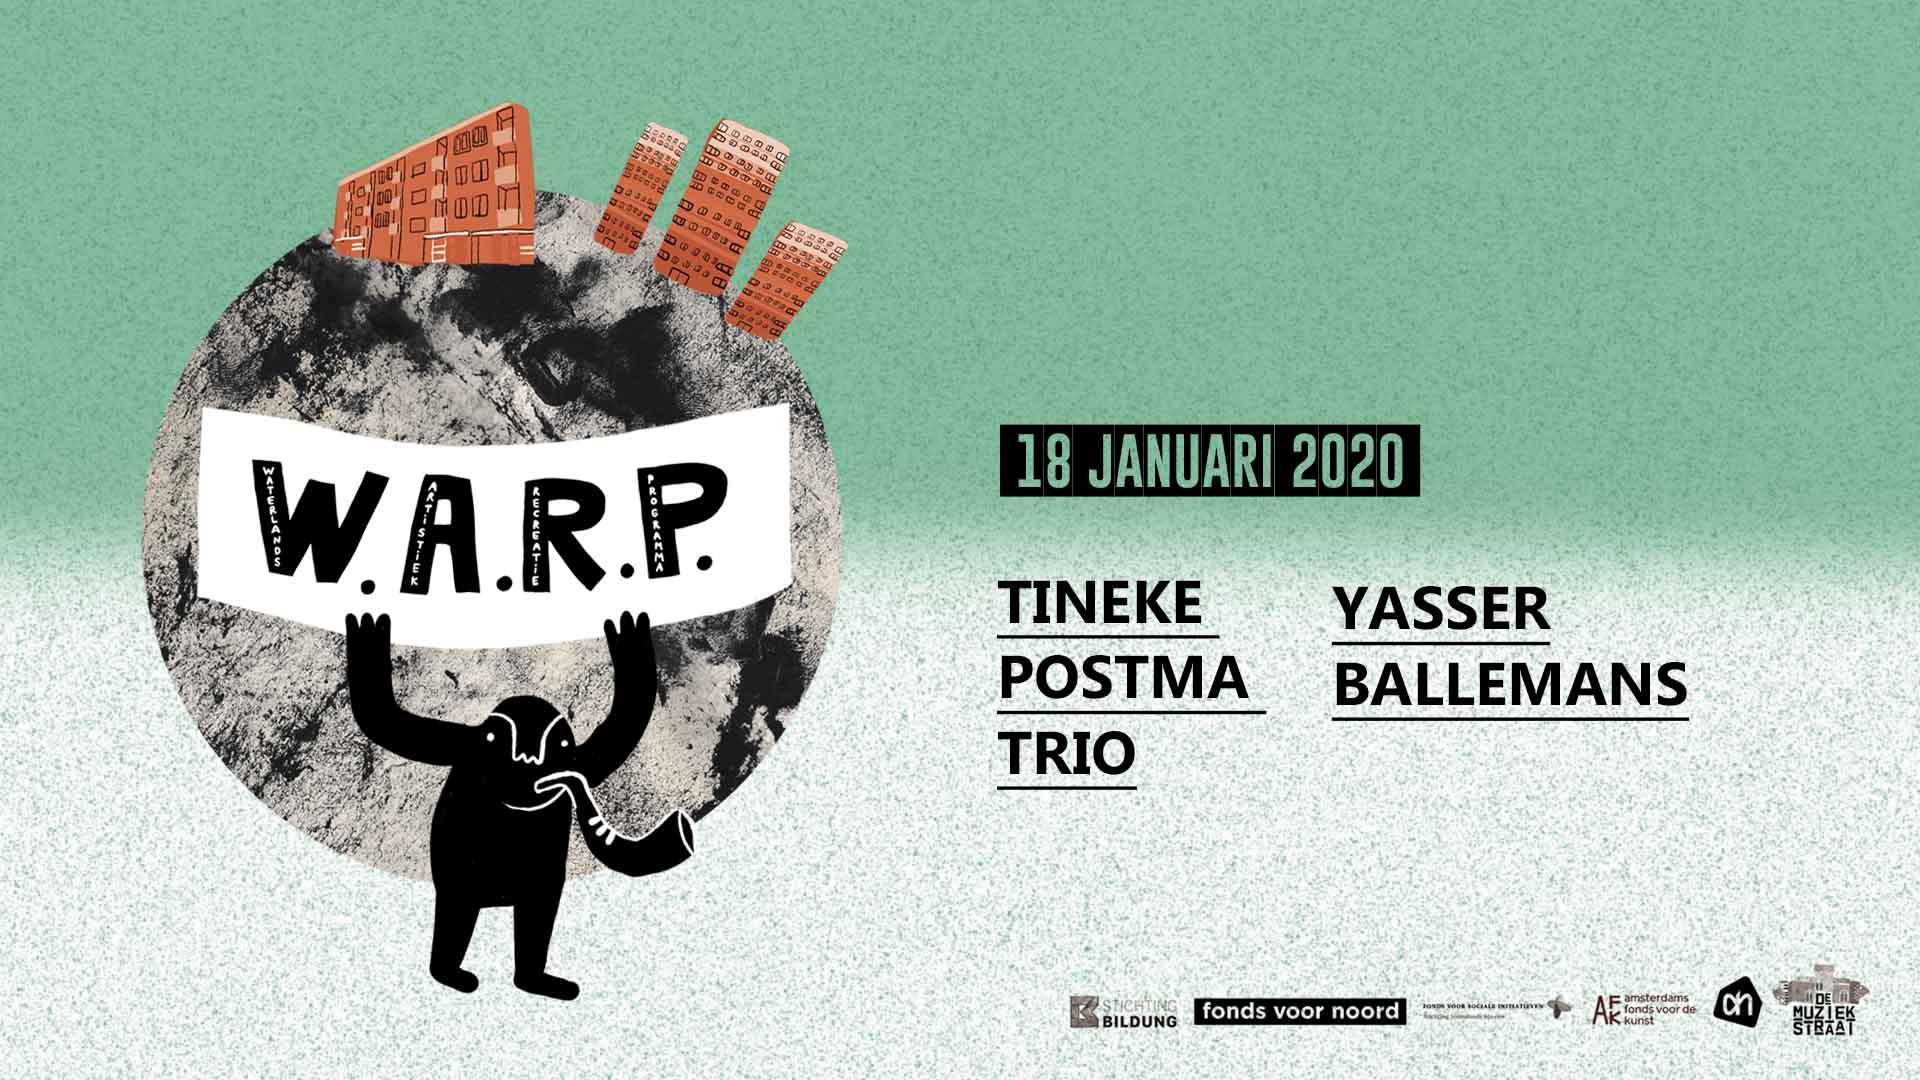 W.A.R.P //Waterlands Artistiek Recreatie Programma // met o.a. Tineke Postma